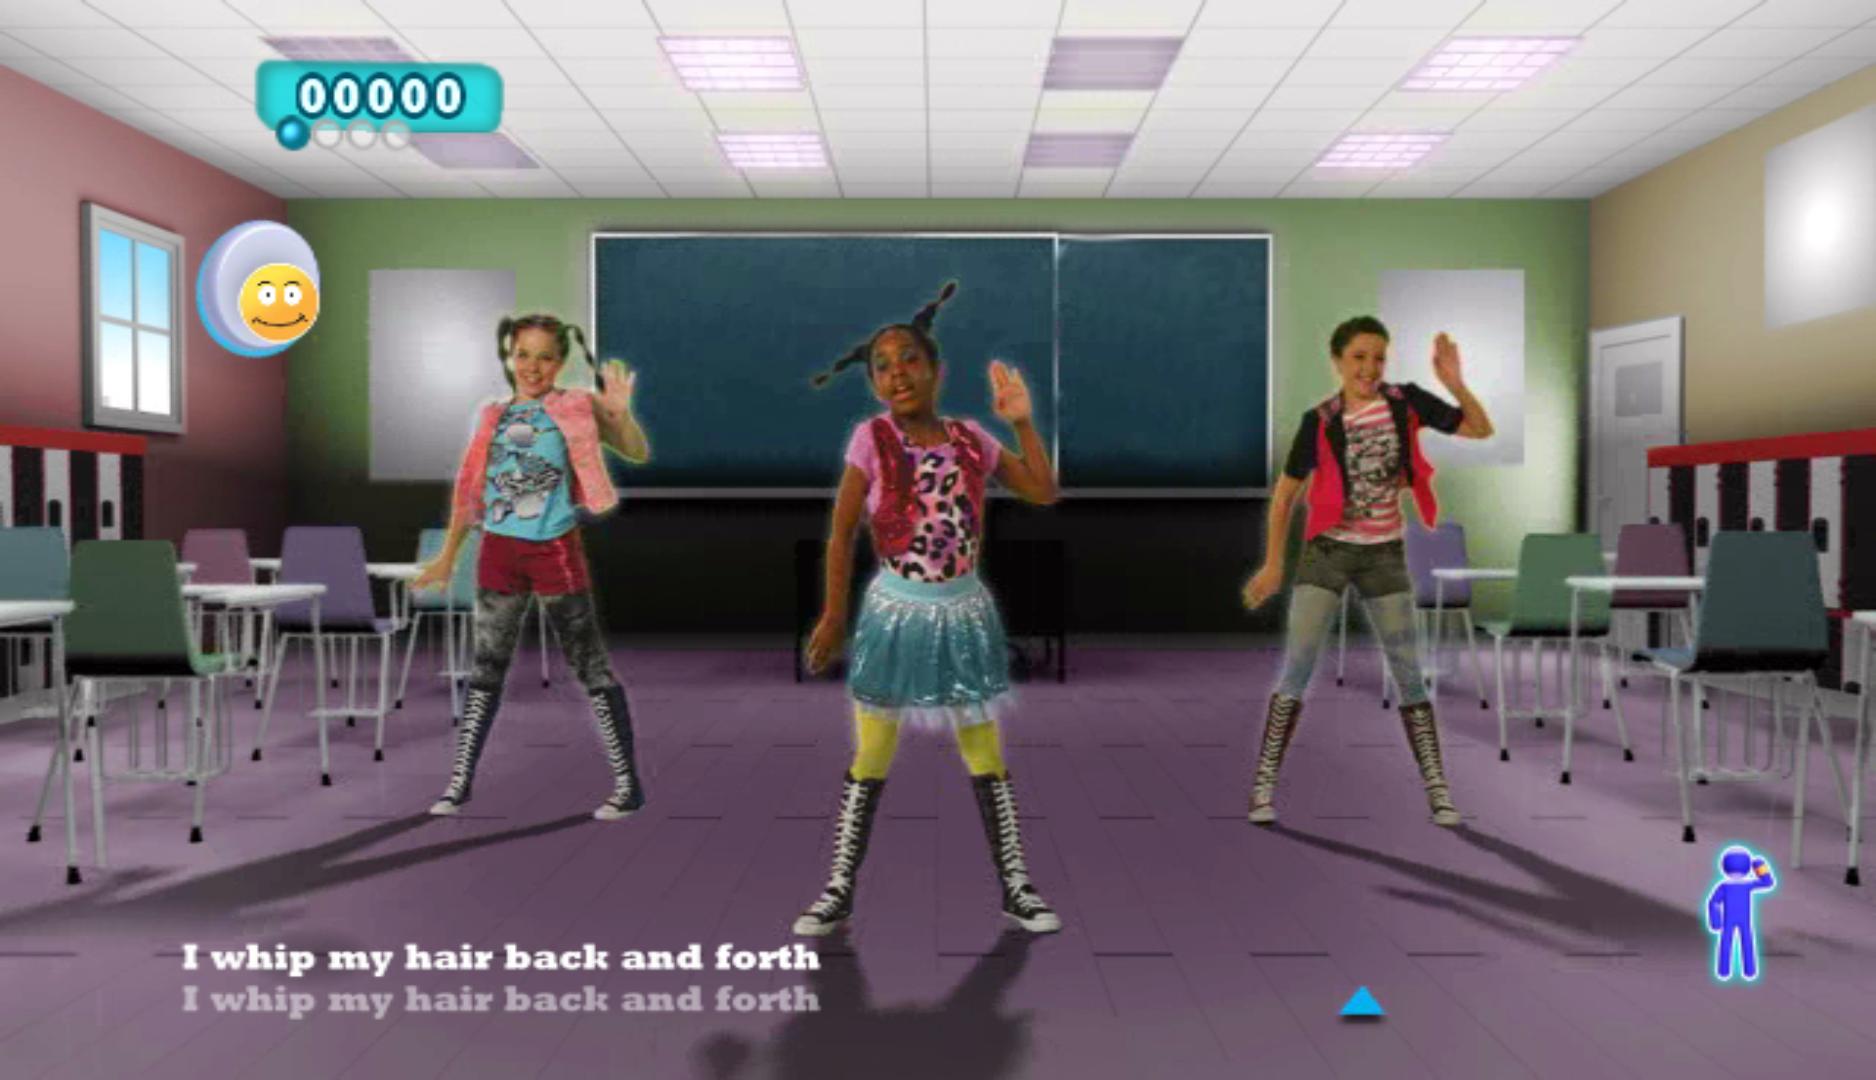 Whip My Hair